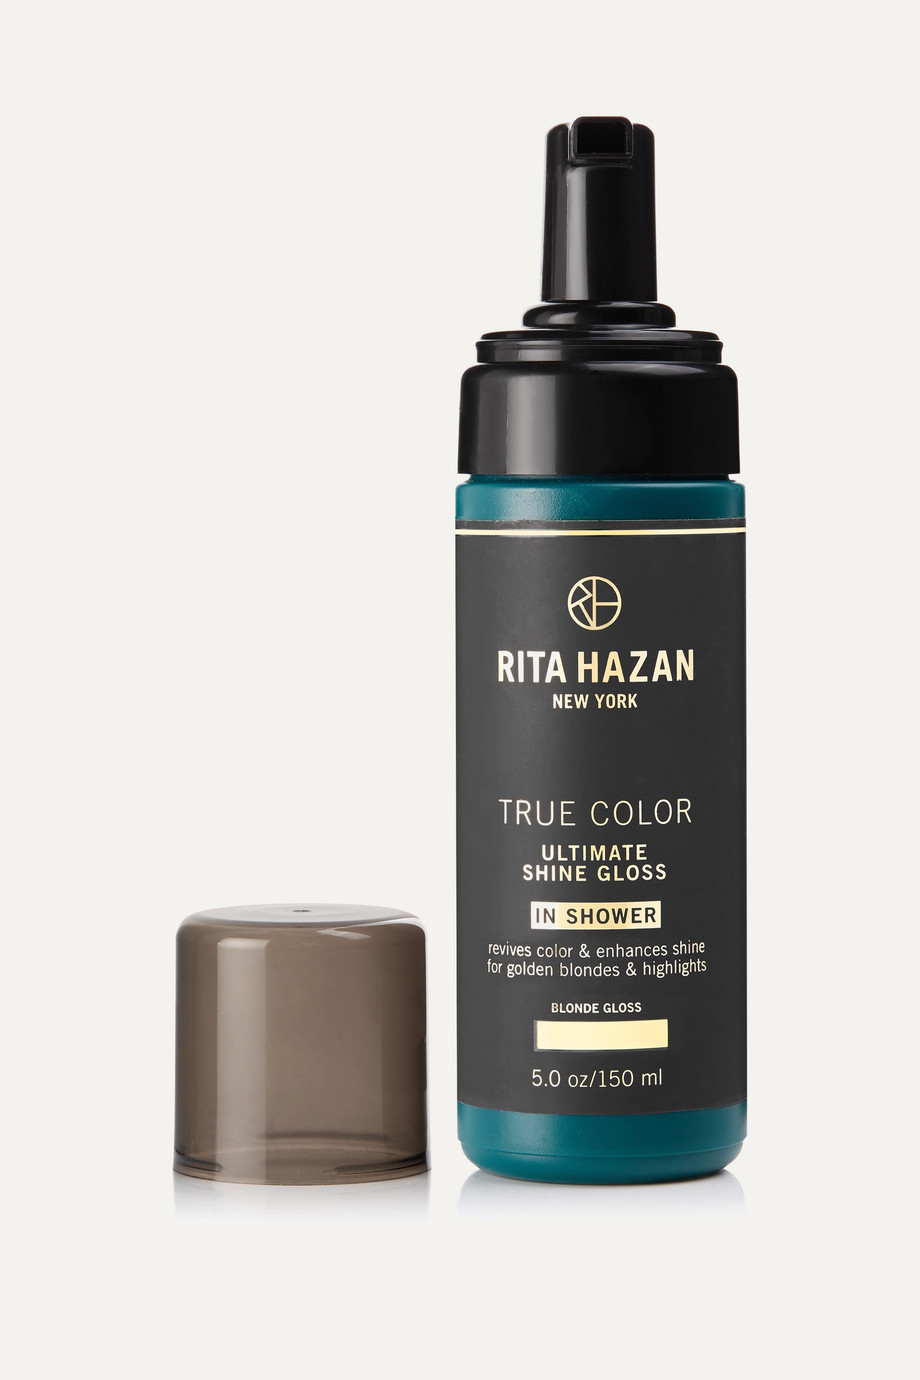 Rita Hazan True Color Ultimate Shine Gloss – Blonde, 150 ml – Farbkur